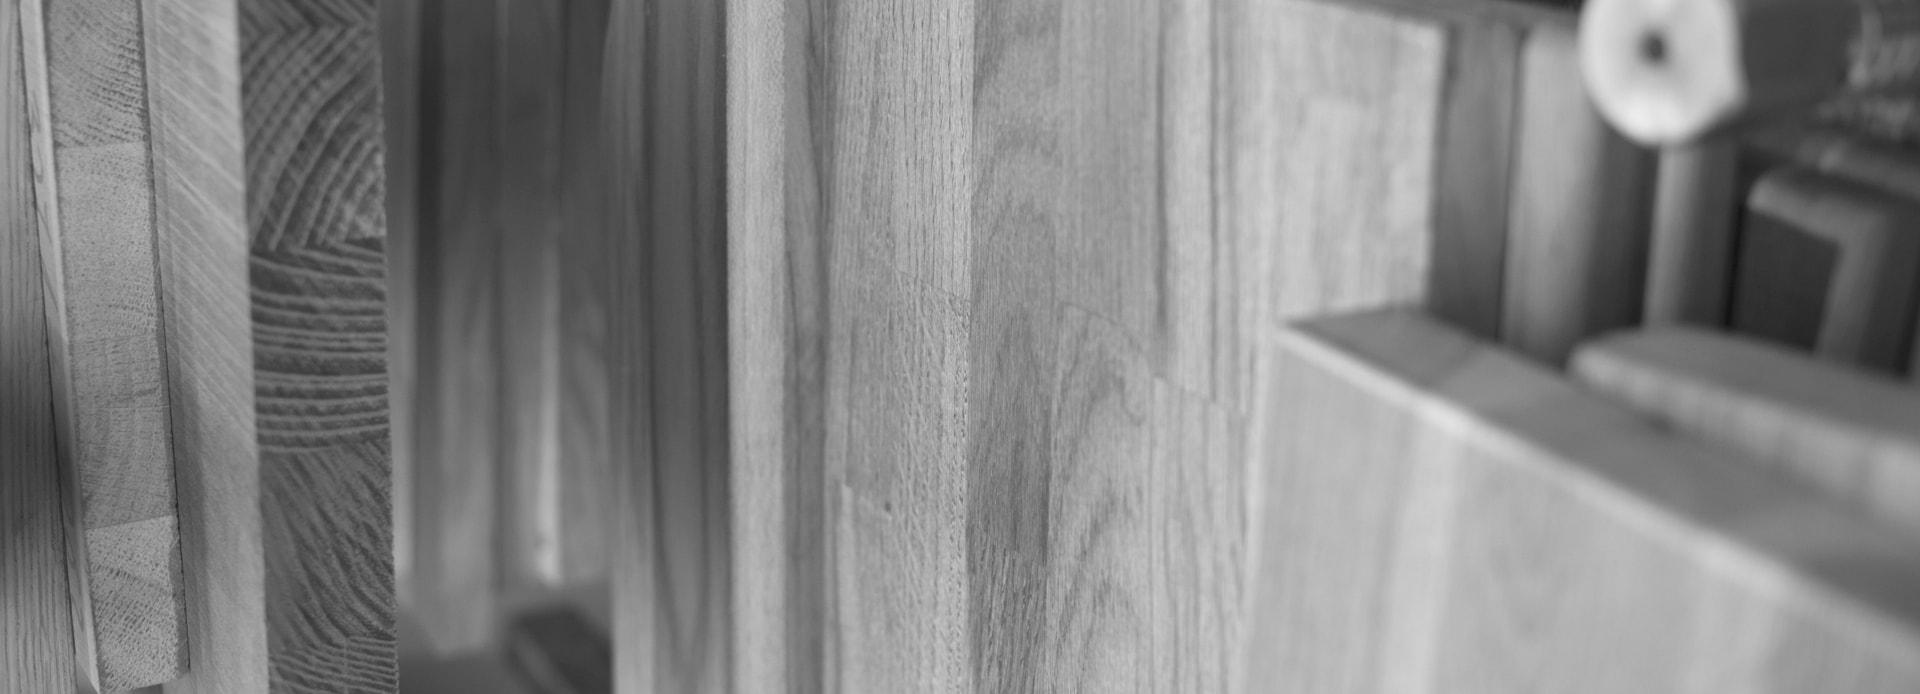 Blaty drewniane baner